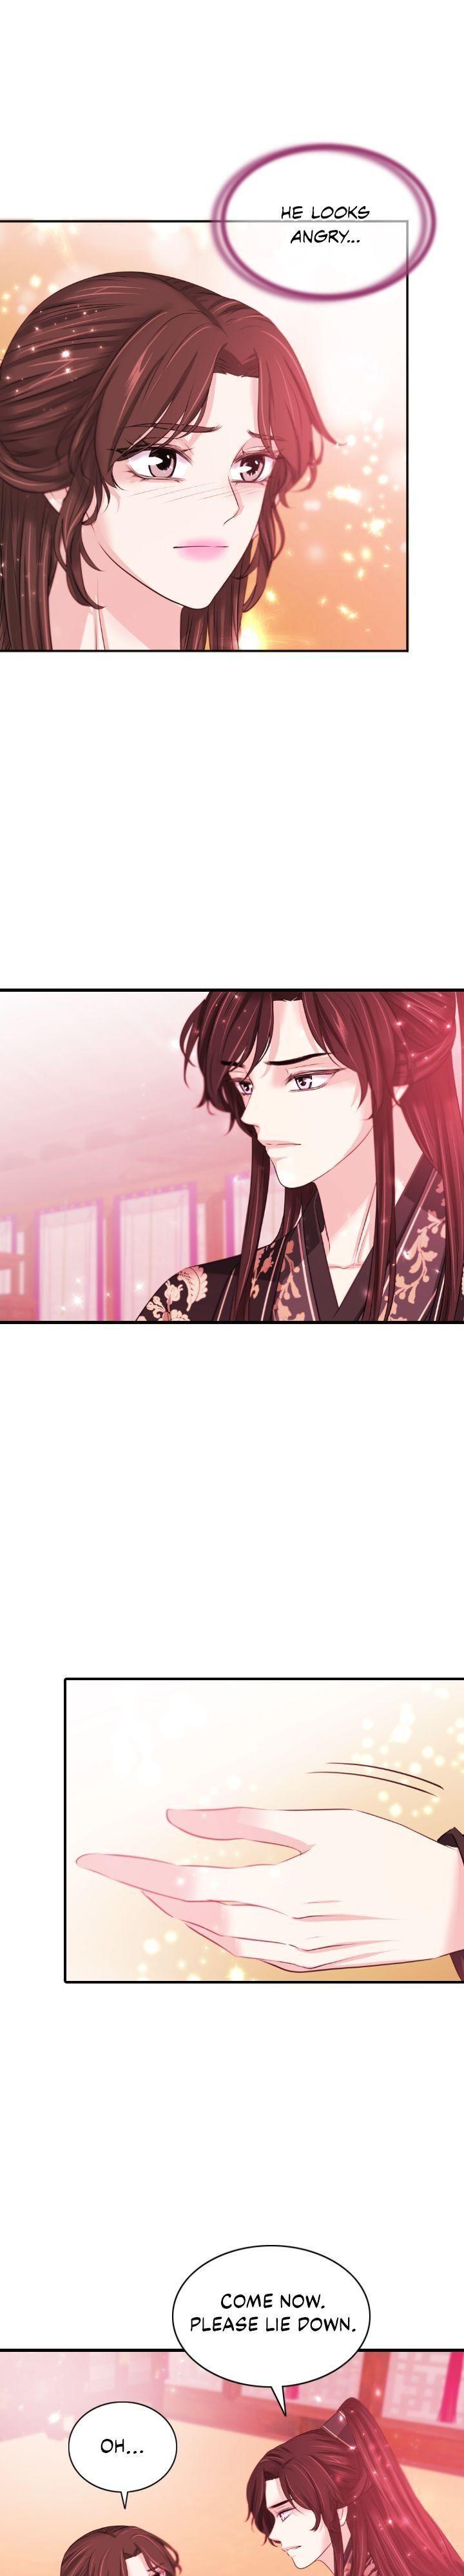 An Inescapable Love Chapter 50 page 10 - Mangakakalots.com